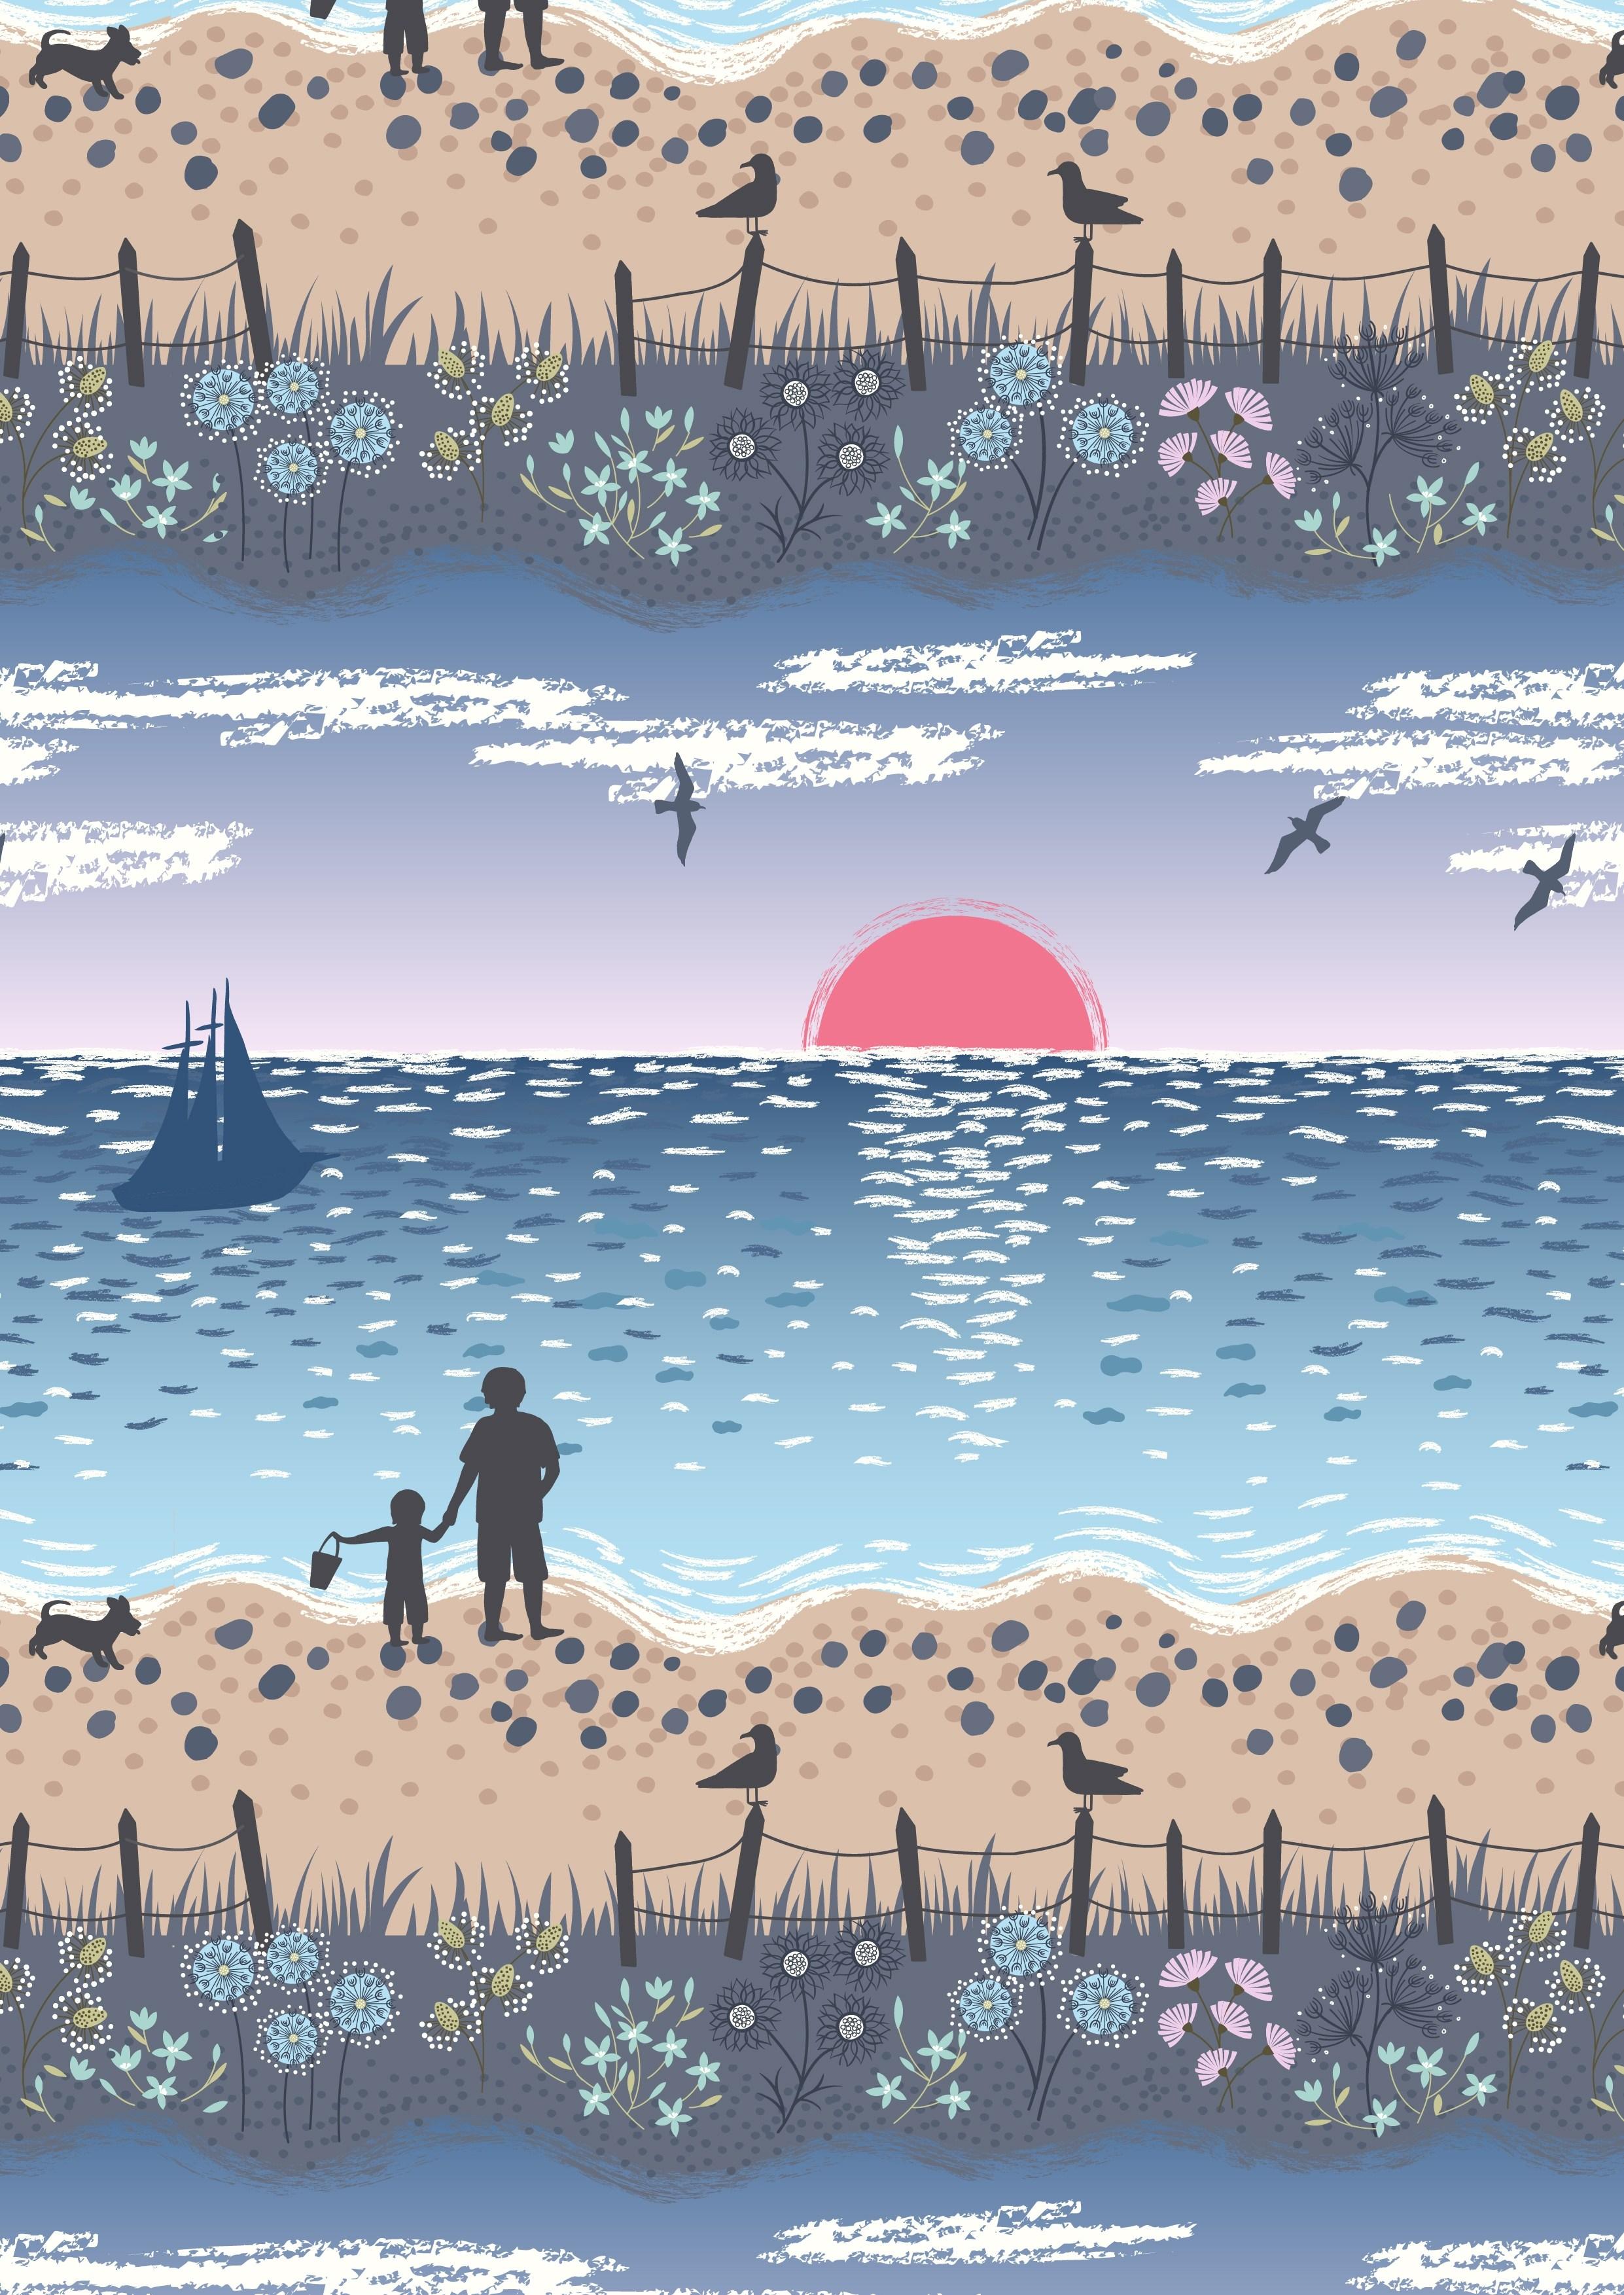 Studland Beach - Deep Blue